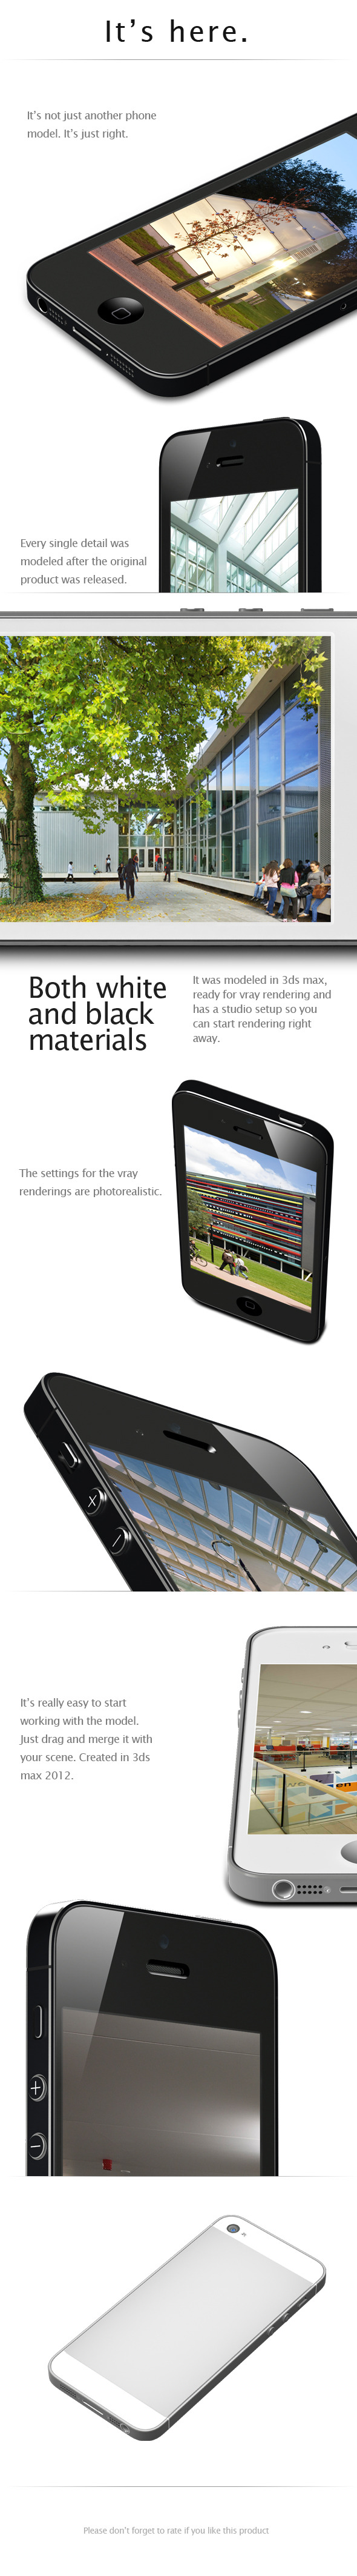 3DOcean iPHONE 5 realistic model 3043160